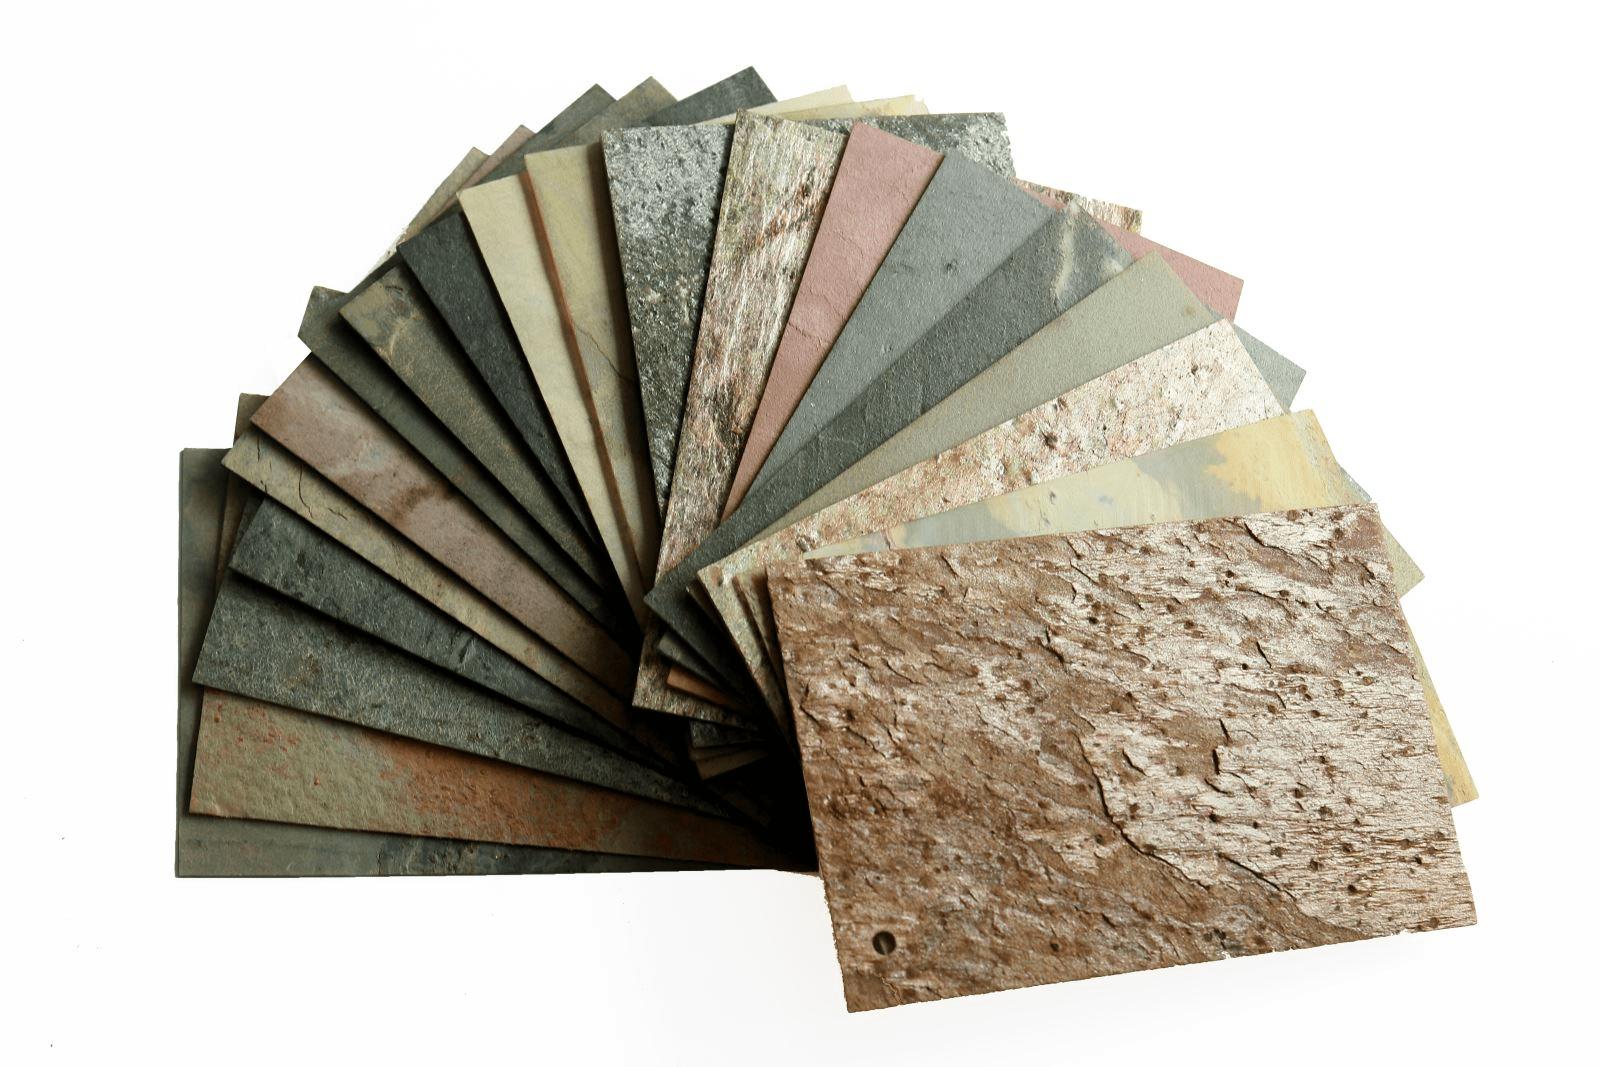 Tấm veneer đá